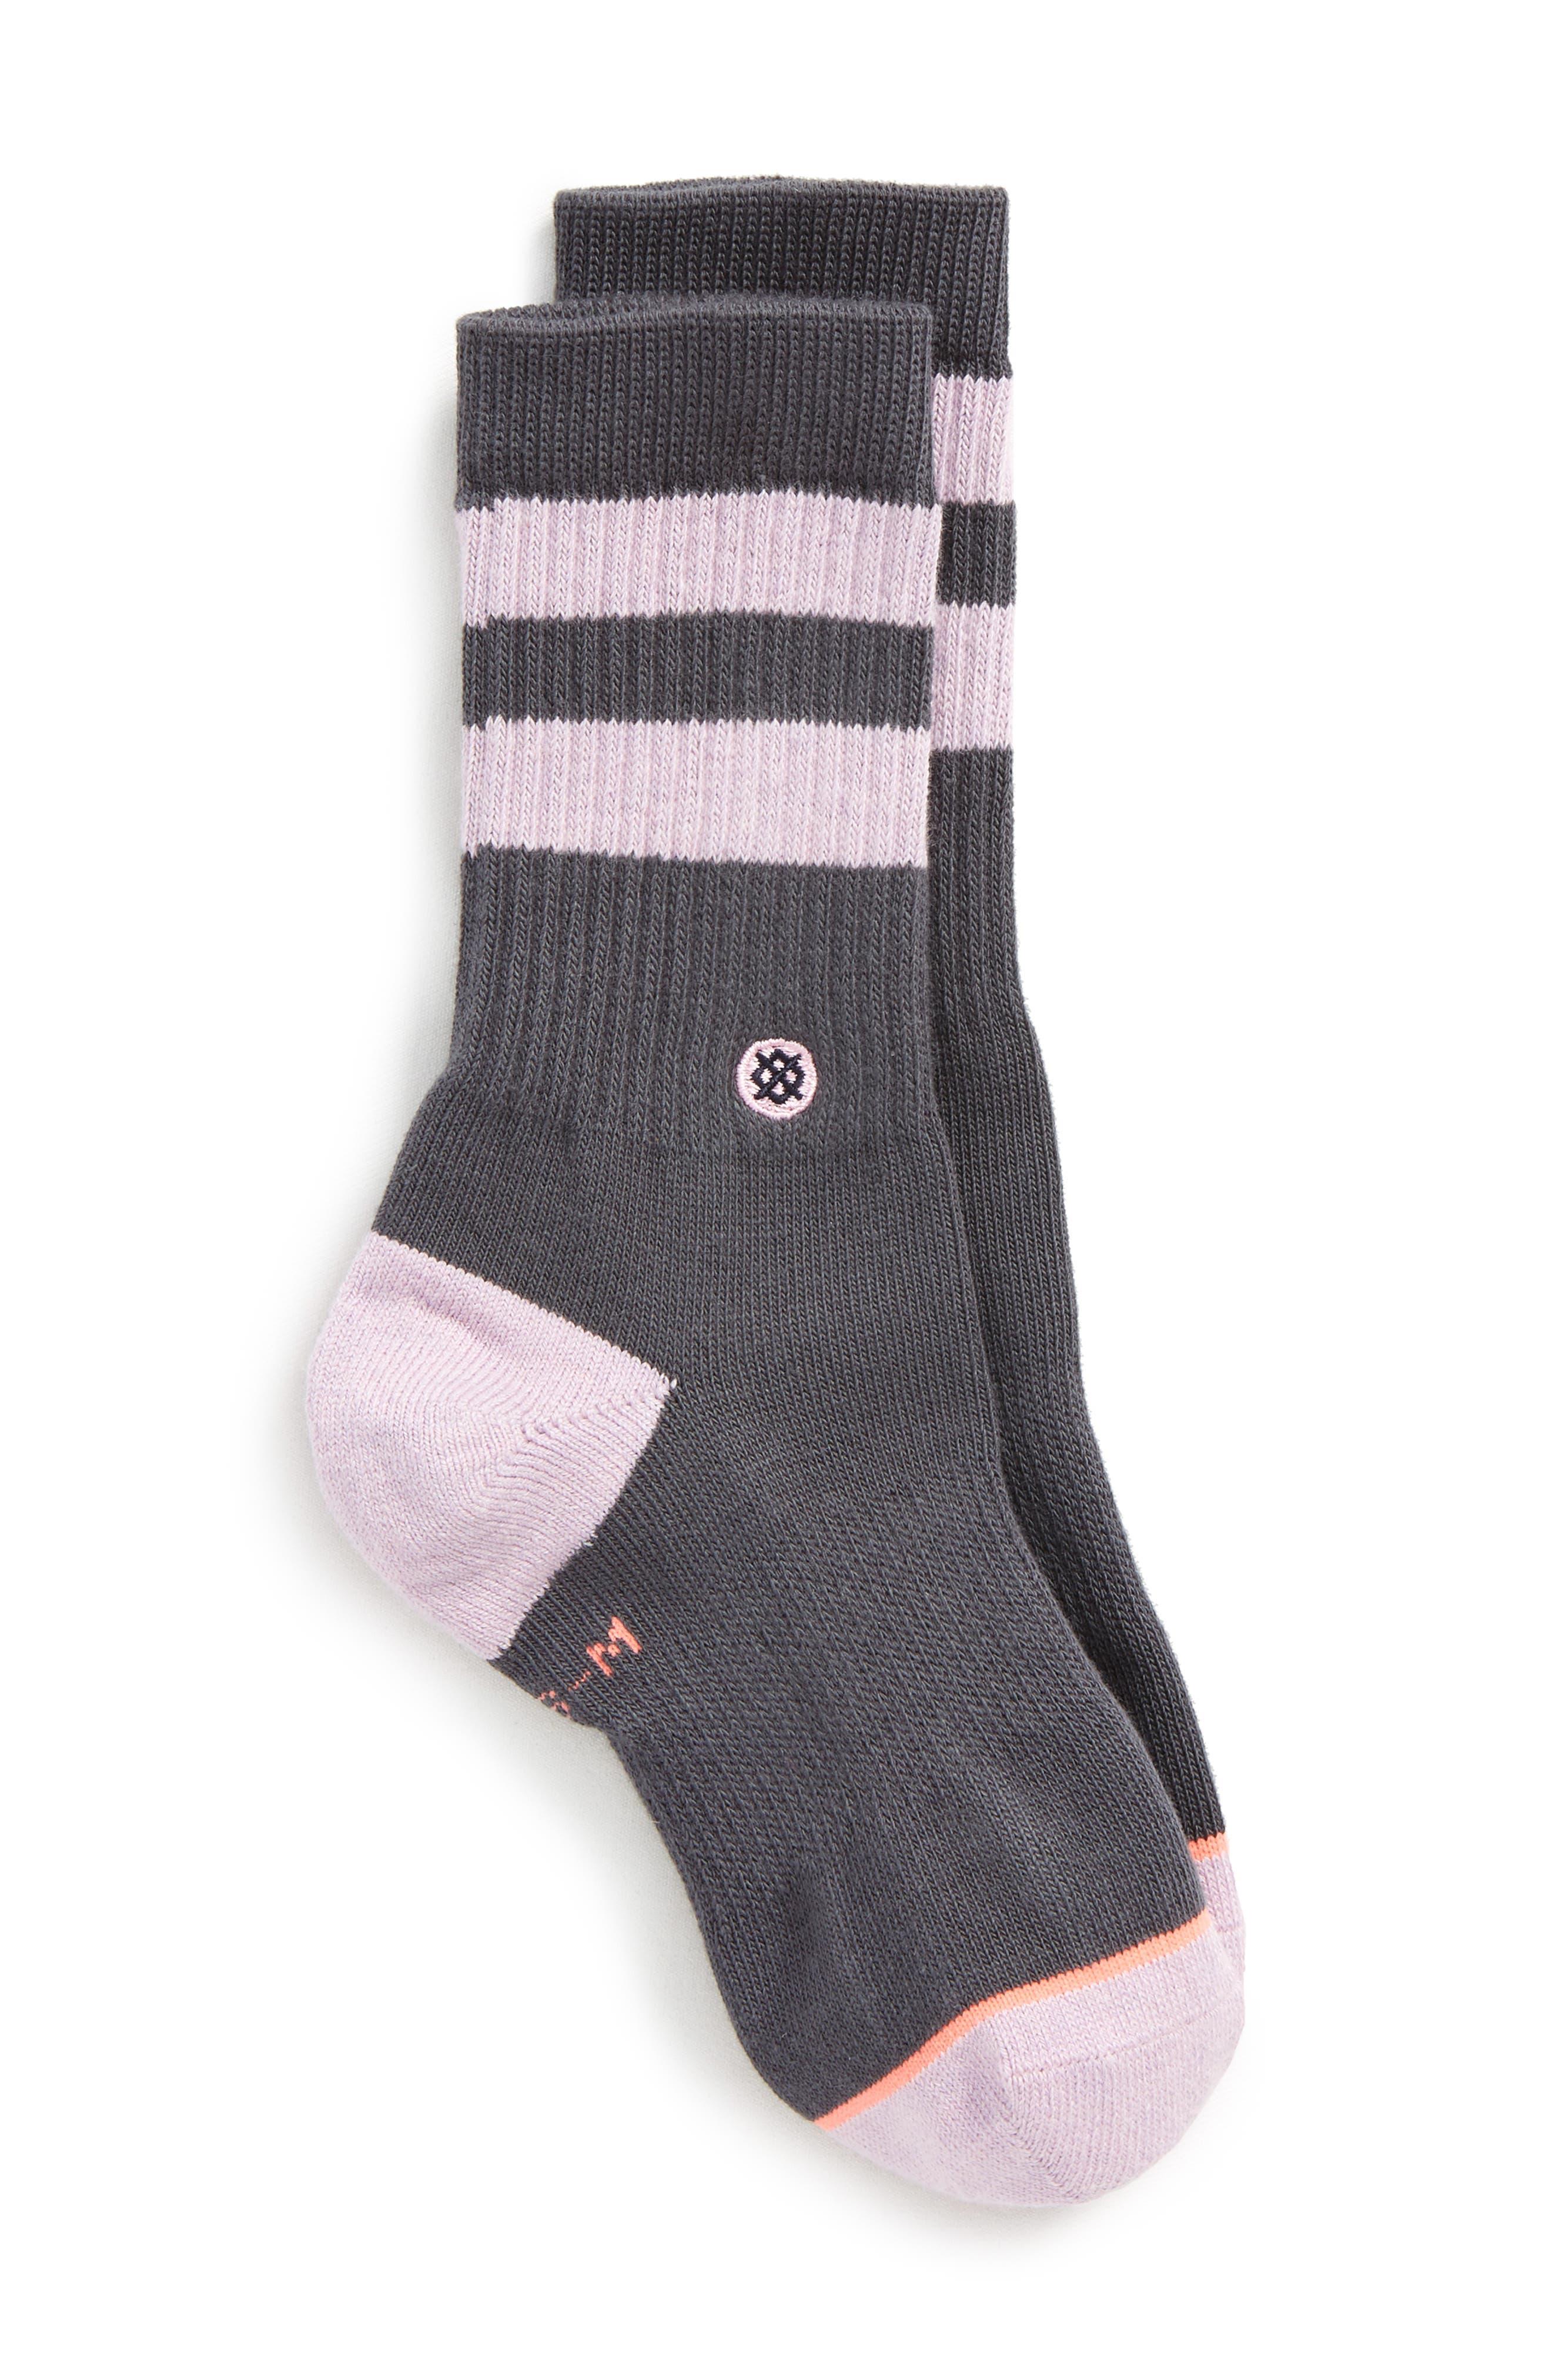 Main Image - Stance Harmony Crew Socks (Toddler, Little Kid & Big Kid)